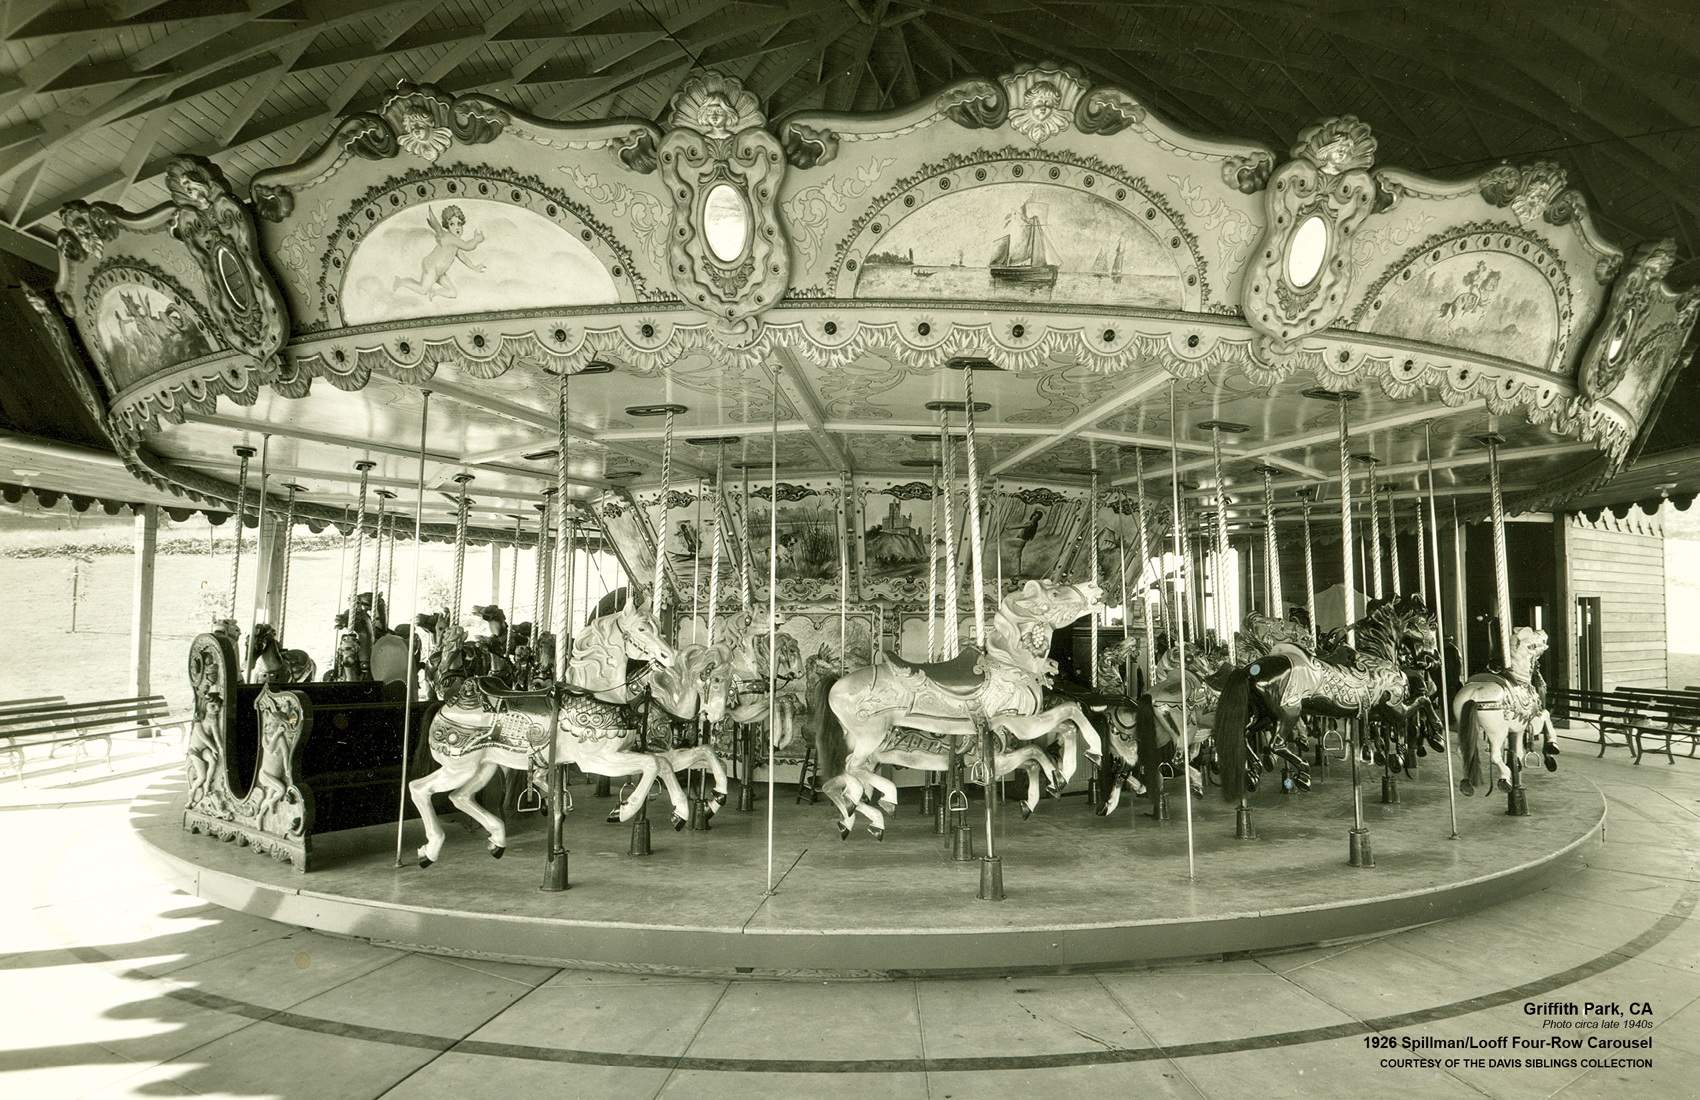 1926-Spillman-Griffith-Park-carousel-Los-Angeles-CNT-center-JAN-08